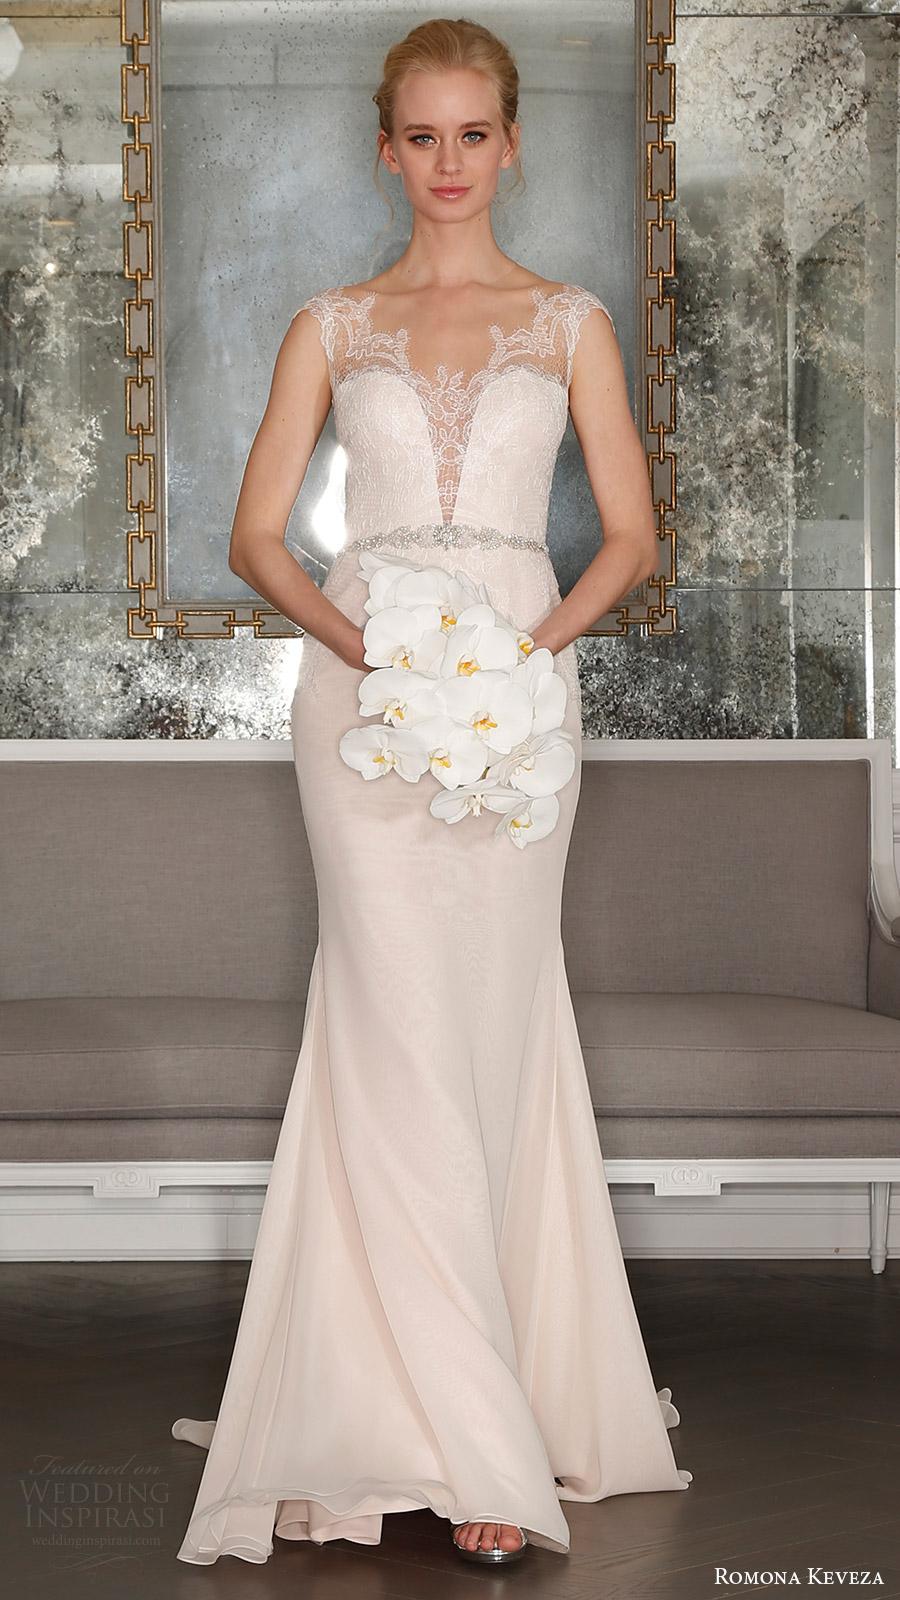 romona keveza bridal spring 2017 illusion cap sleeves sweetheart deep vneck sheath wedding dress (rk7405nt) mv